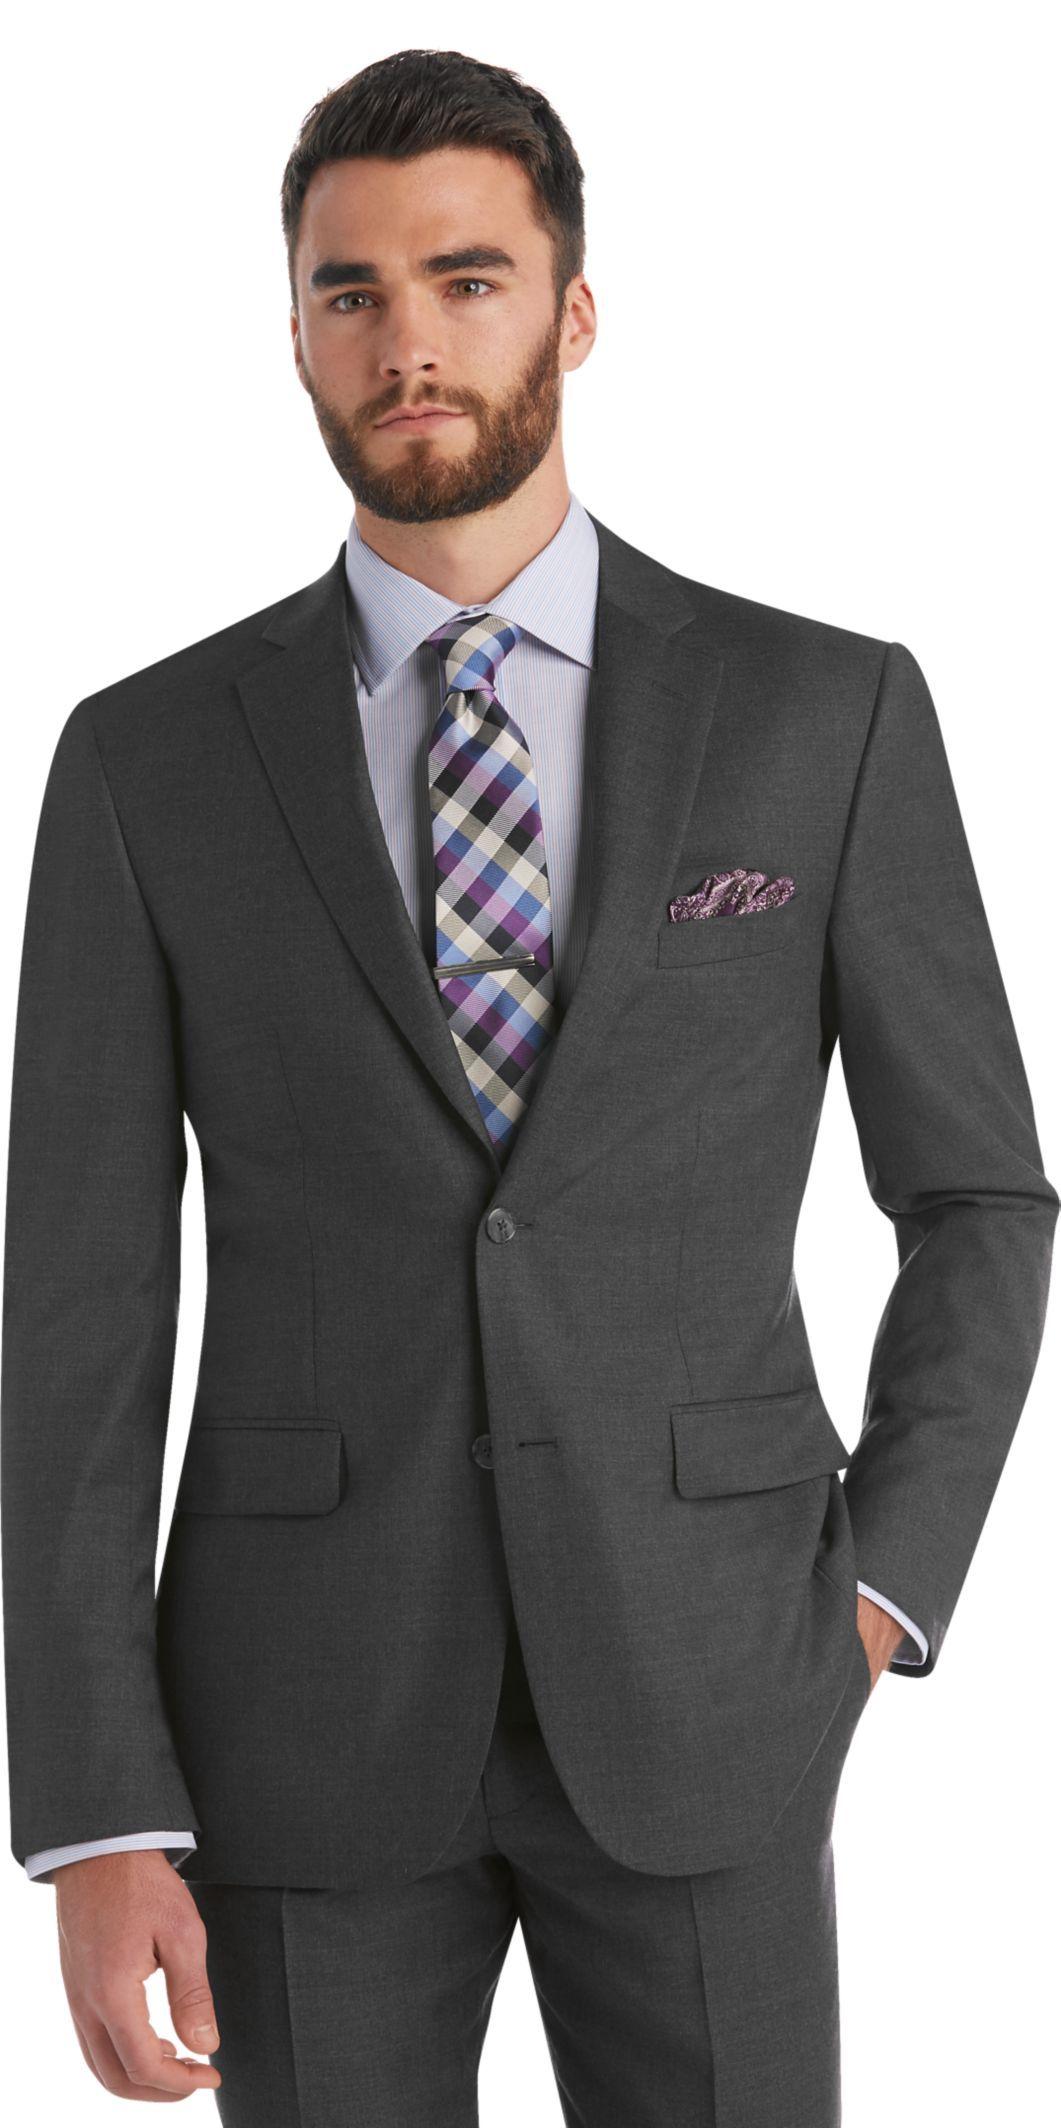 Traveler Collection Regal Fit Suit Separate Jacket